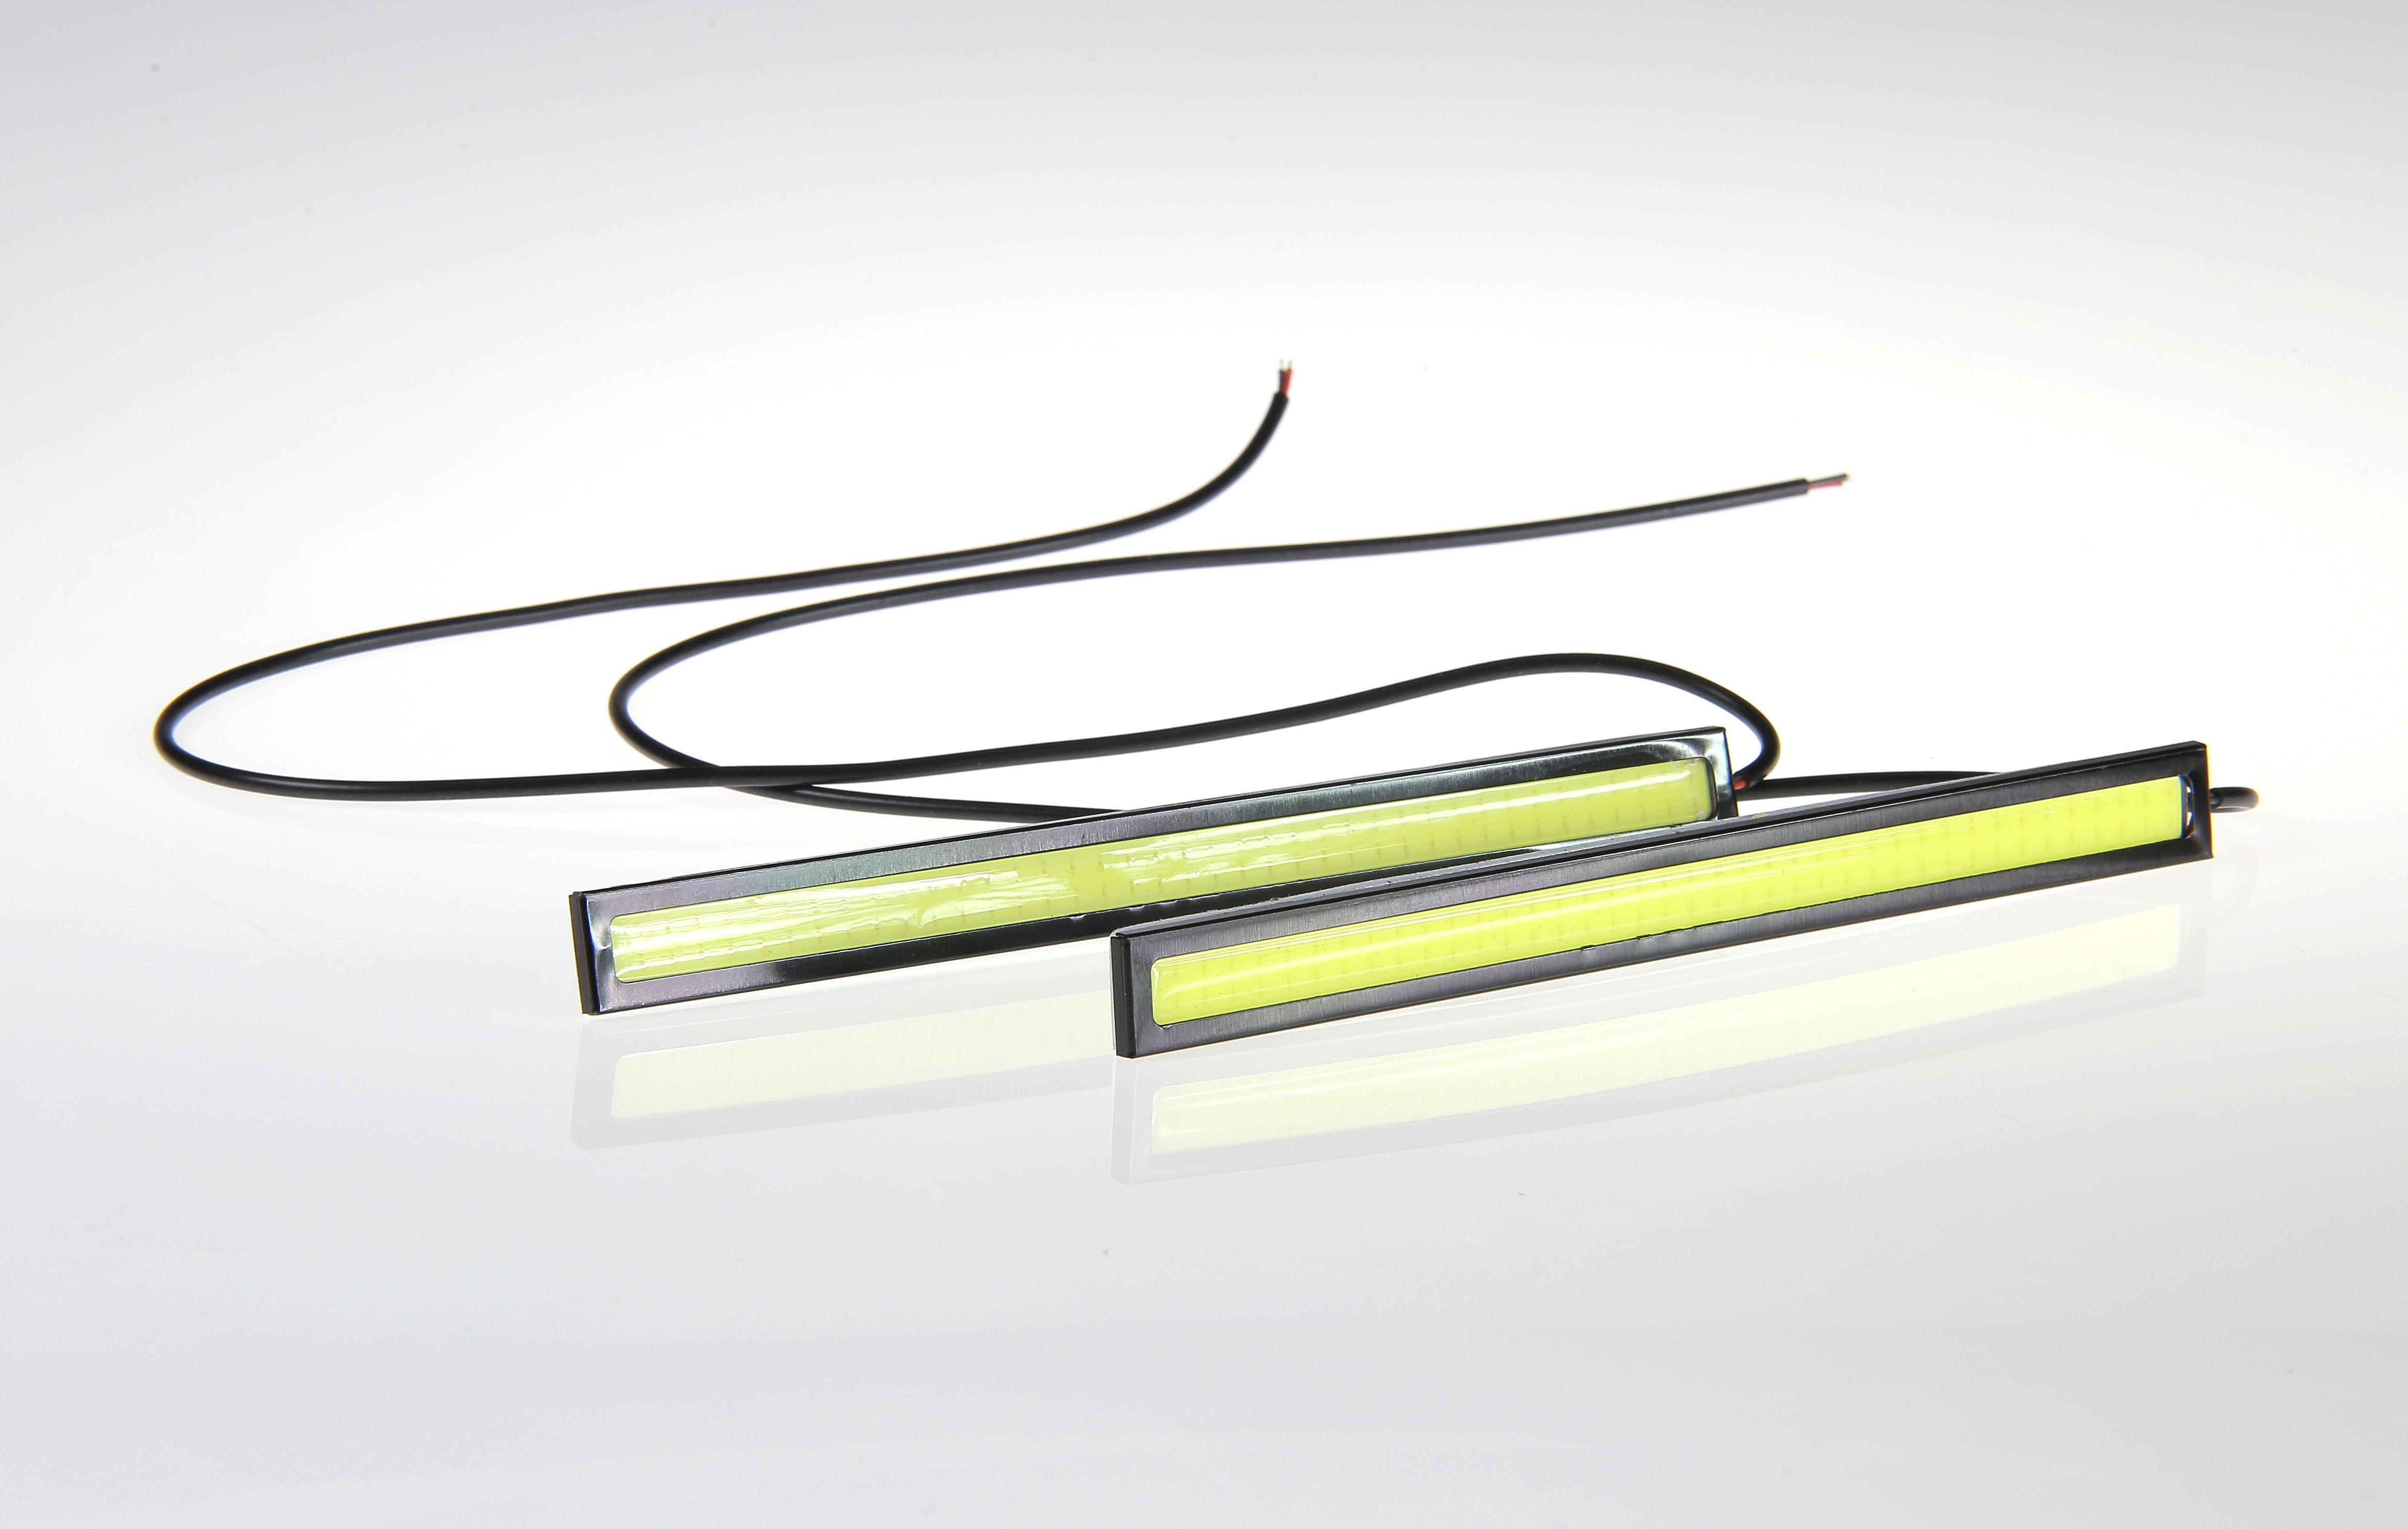 Panel LED oświetlenia kabiny/wnętrza 12V